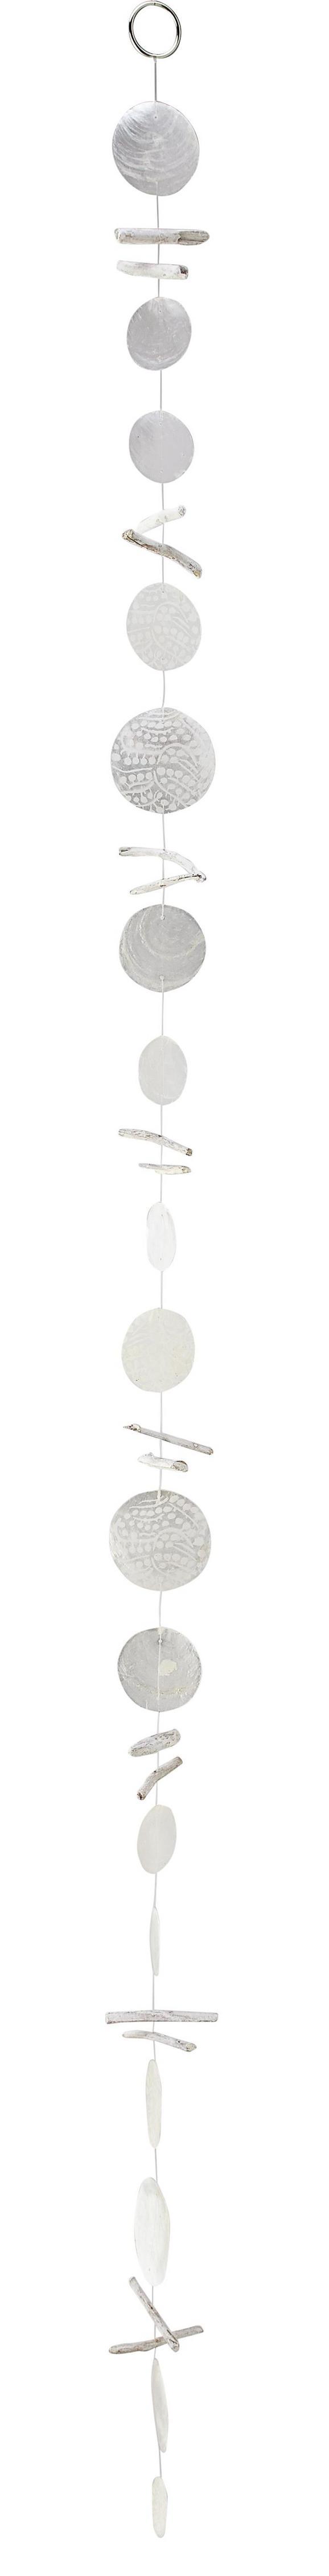 Girlanda Carina - bela, Romantika, ostali naravni materiali/les (180cm)